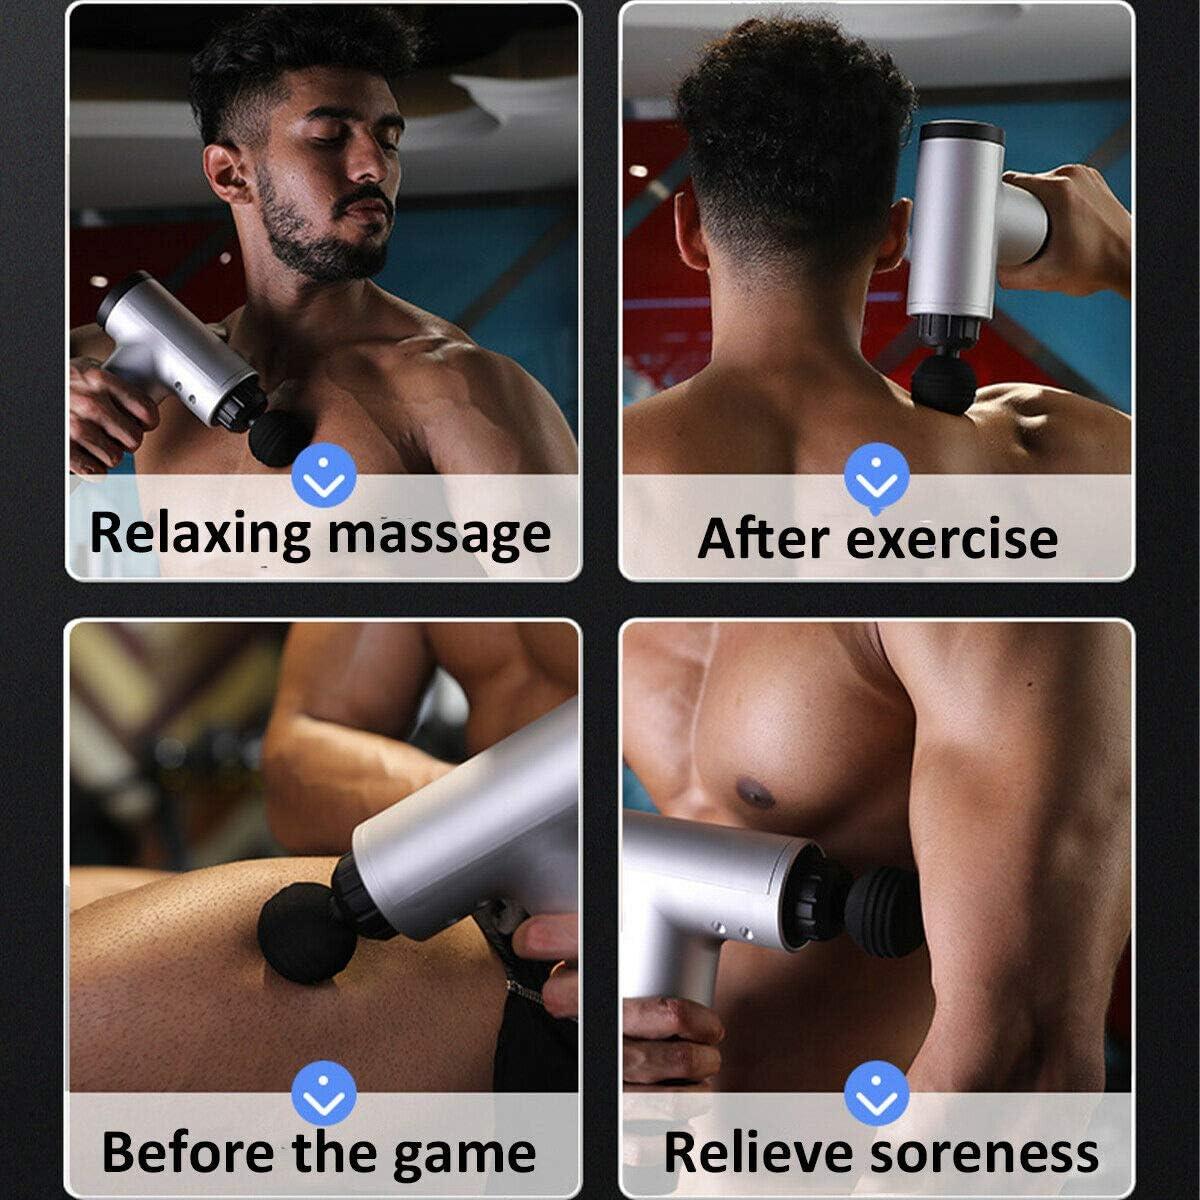 LCD Screen Gear Display Electric Muscle Relaxer Vibration Massager TIAS Muscle Massage Gun 6-Speed Hand-Held Deep Tissue Muscle Massager